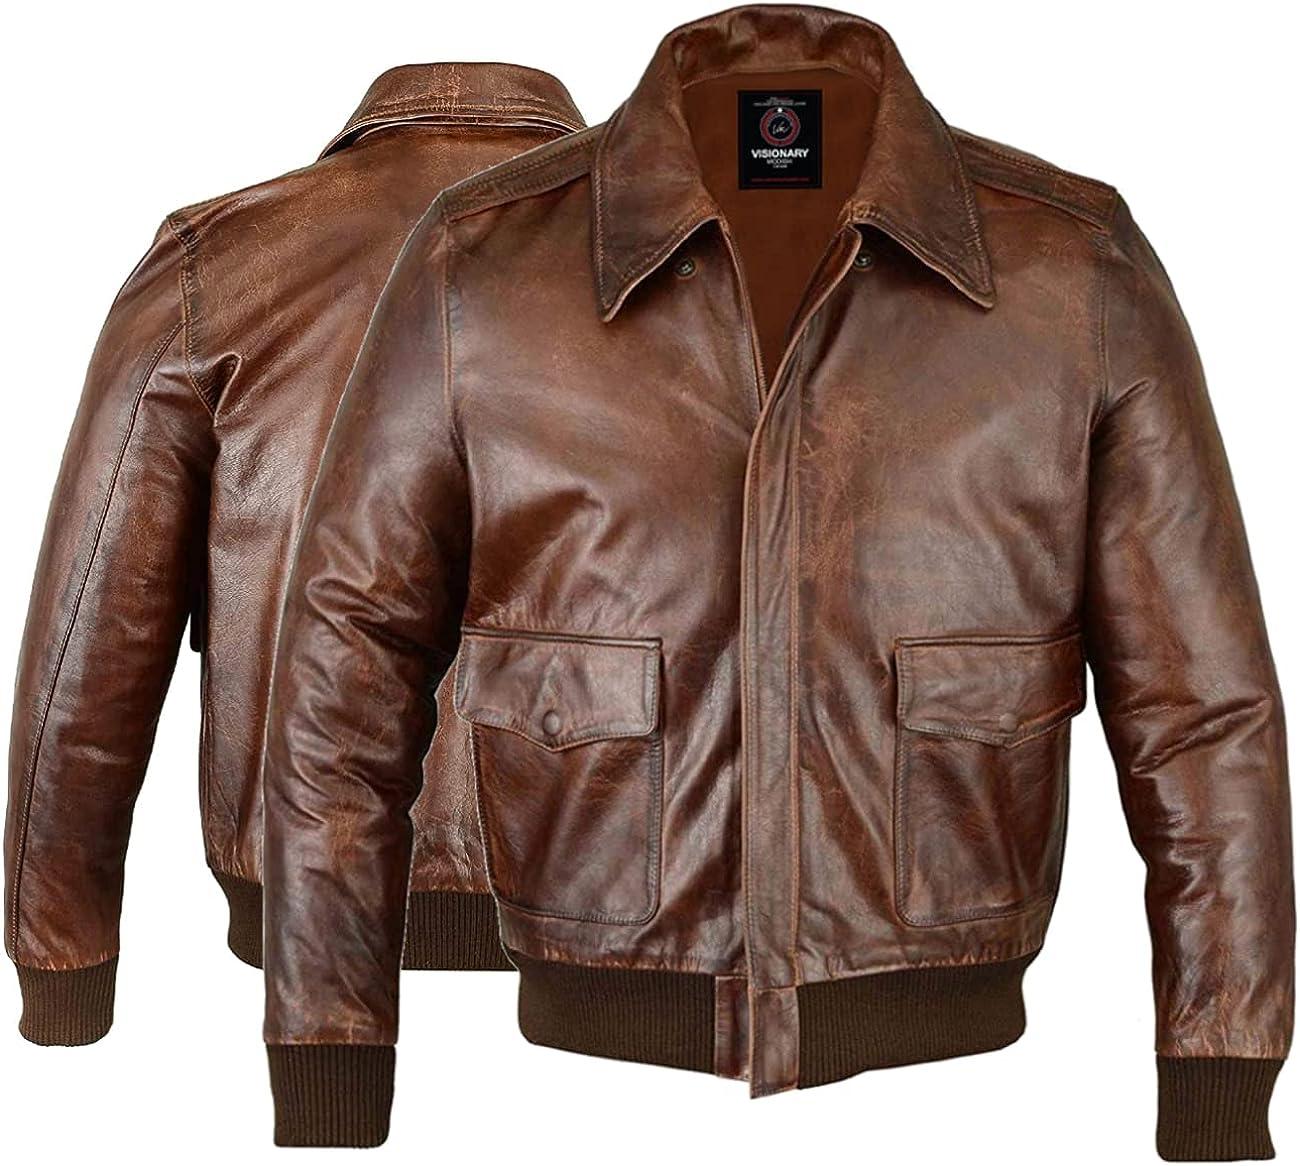 Men's Fashion Air Force A-2 Flight Bomber Genuine Goat Hide One Skin Leather Jacket For Men - VM19217258